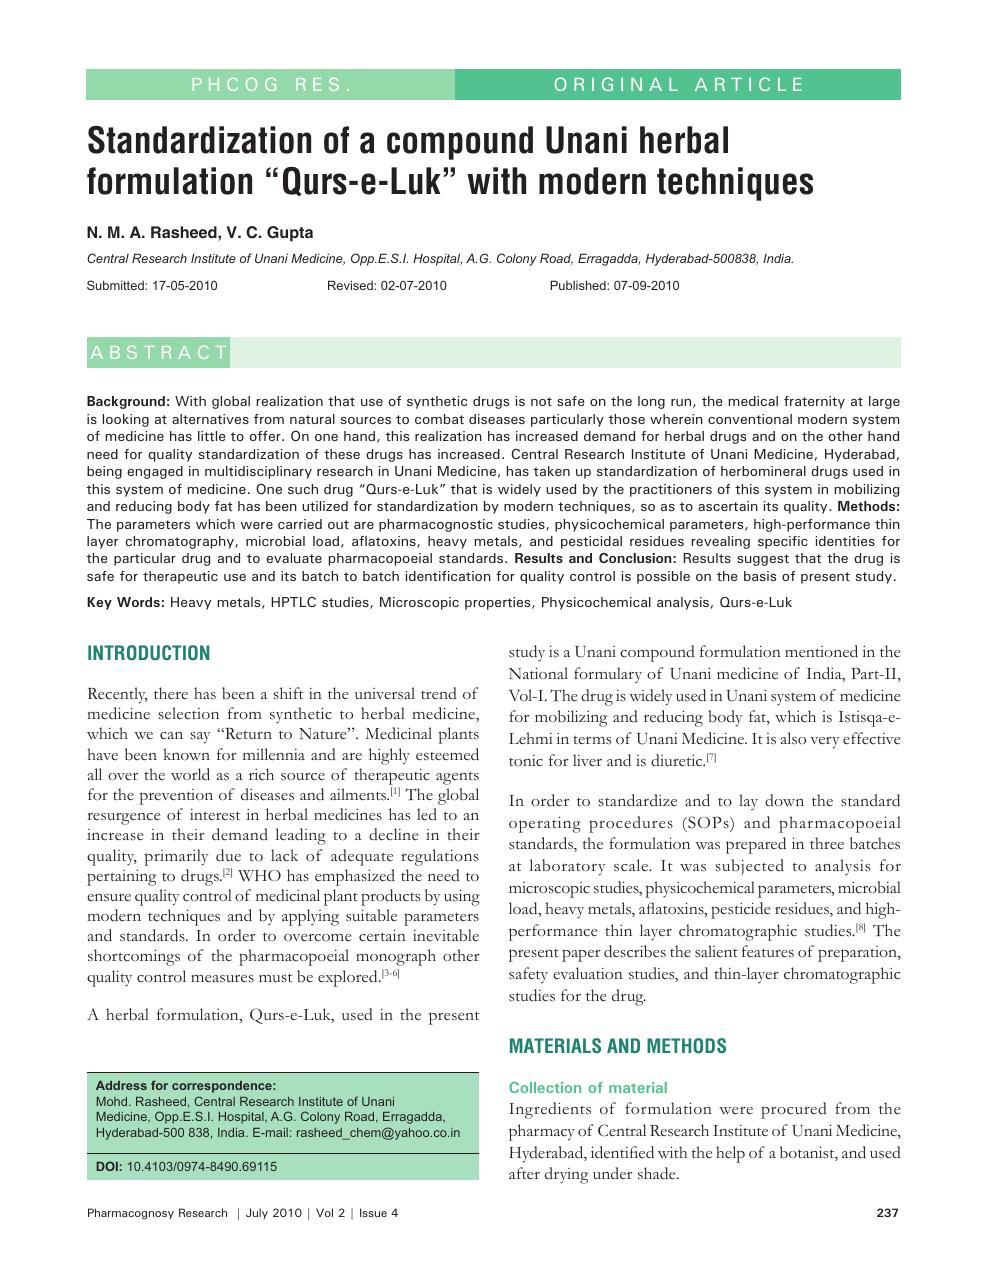 Standardization Of A Compound Unani Herbal Formulation Qurs